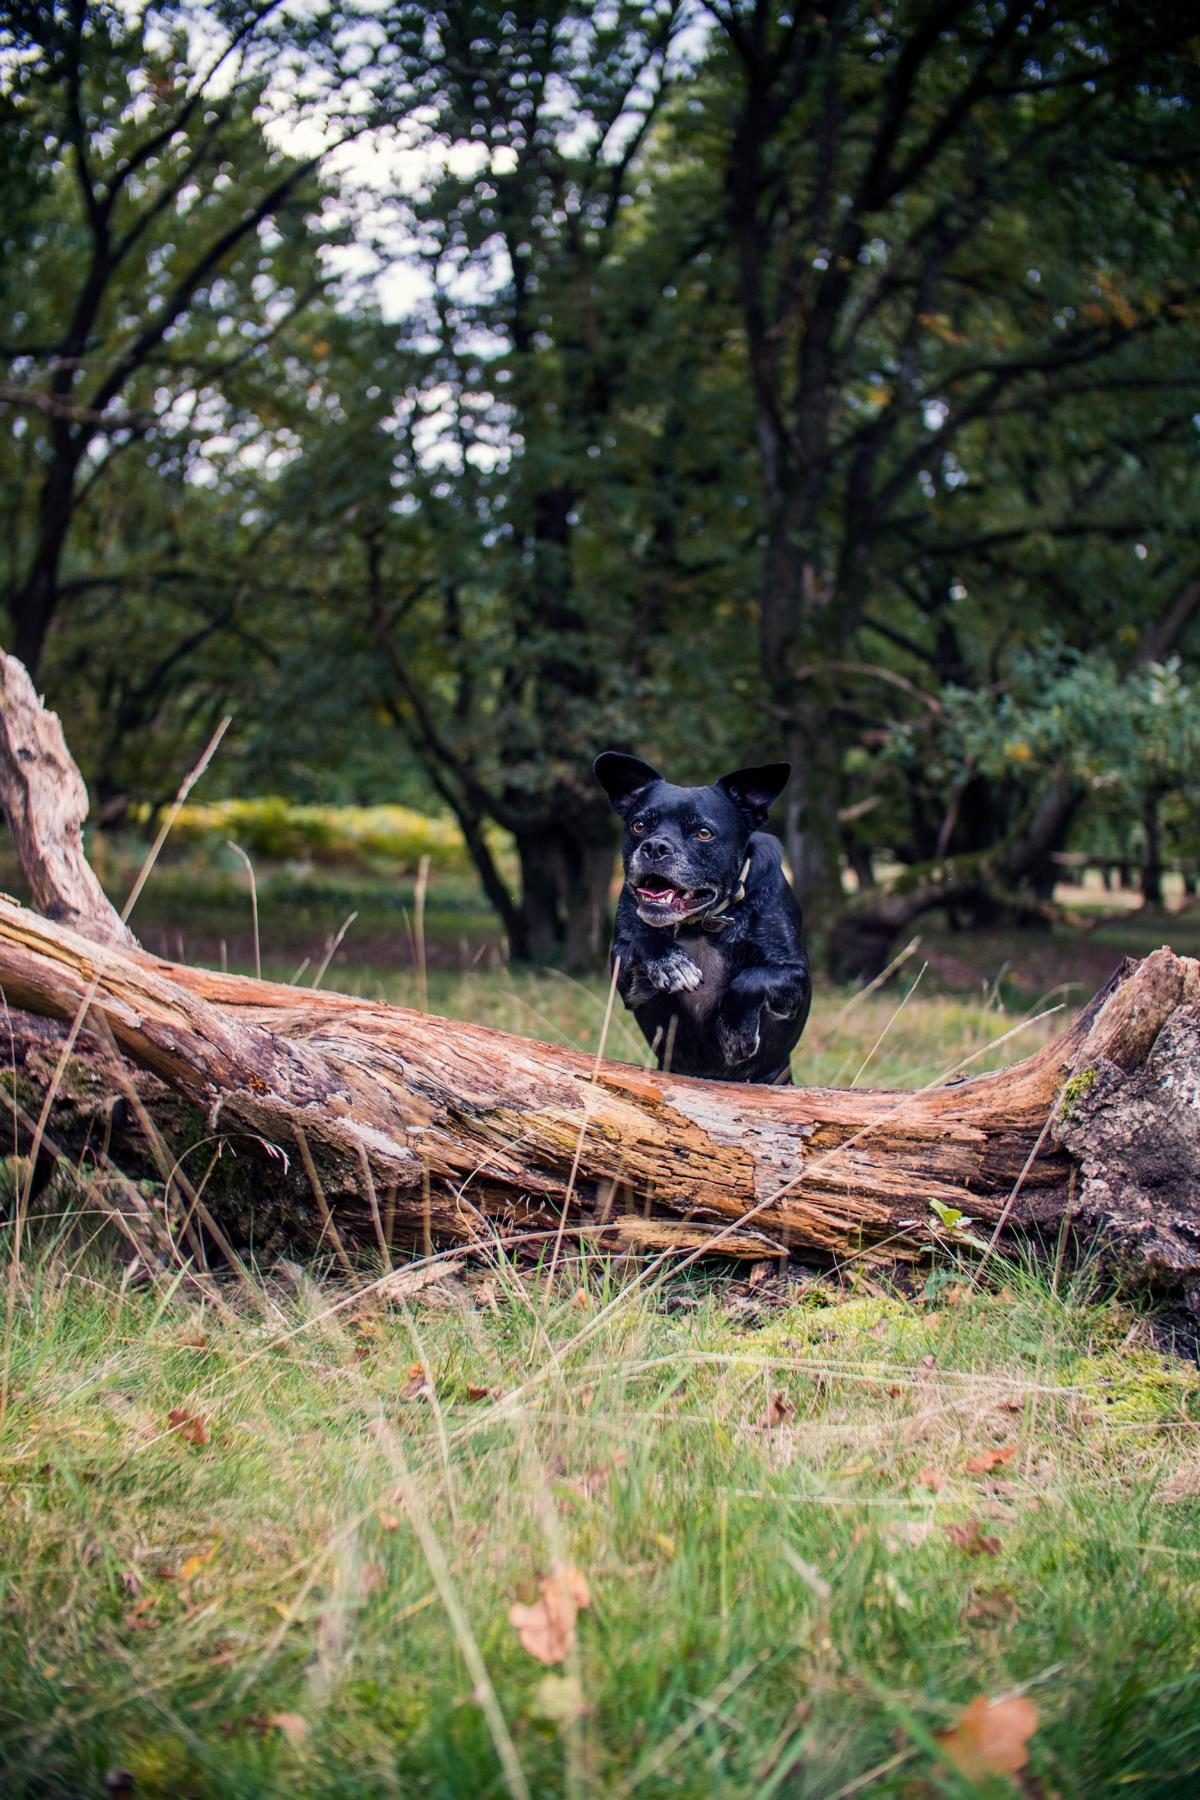 Mix Hund Natur Black Dog